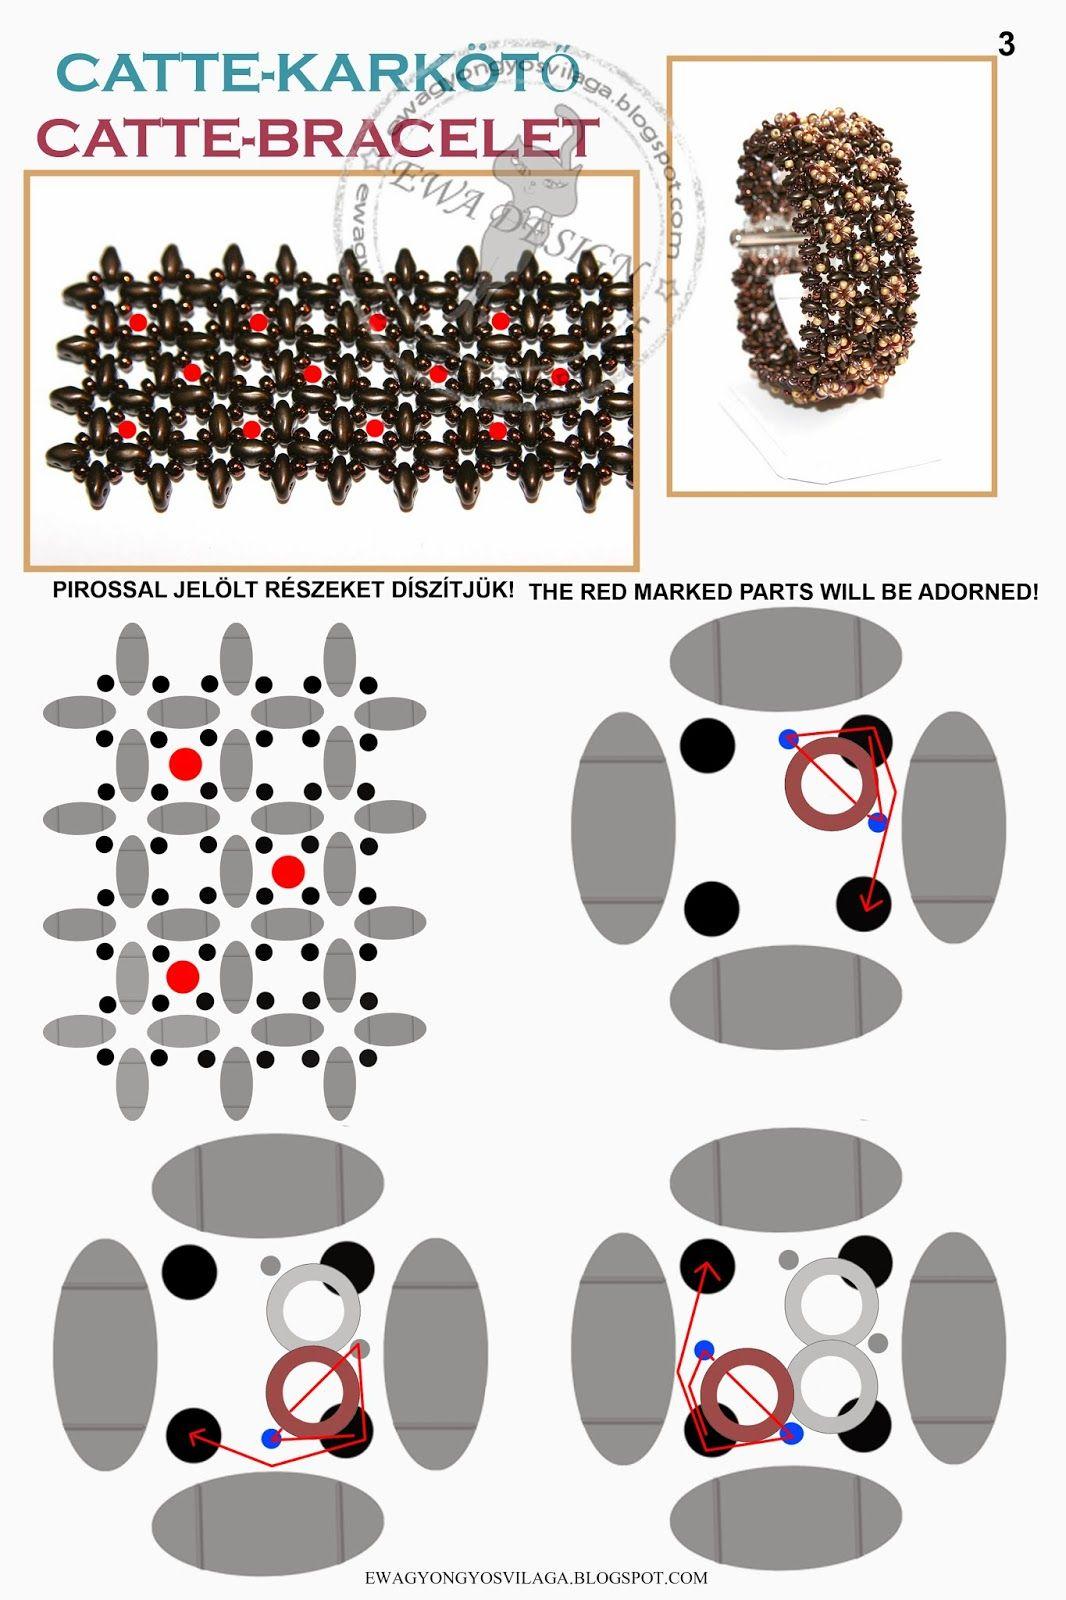 Ewa gyöngyös világa!: Catte karkötő minta / Catte bracelet pattern